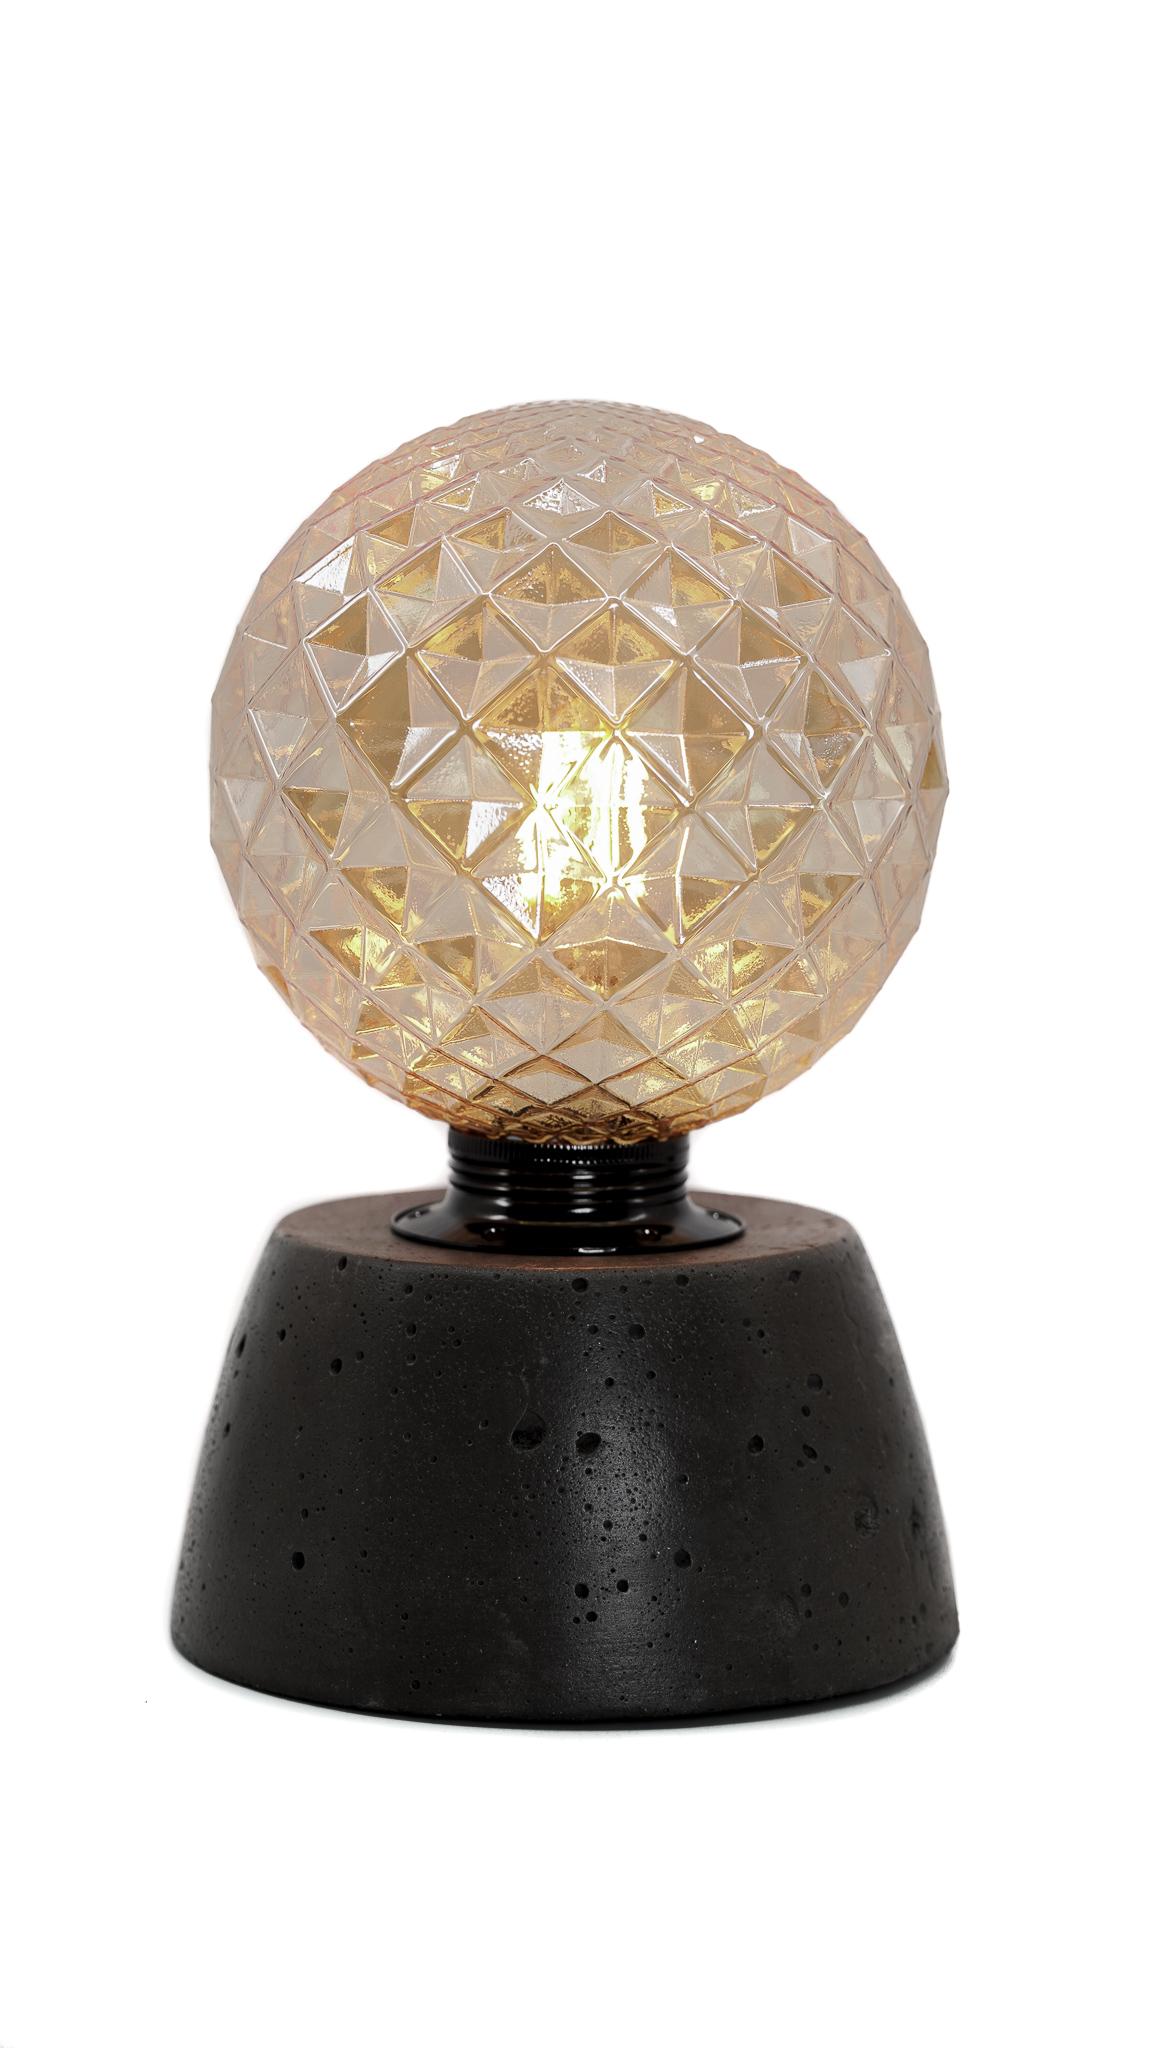 Lampe dôme diamant béton anthracite fabrication artisanale